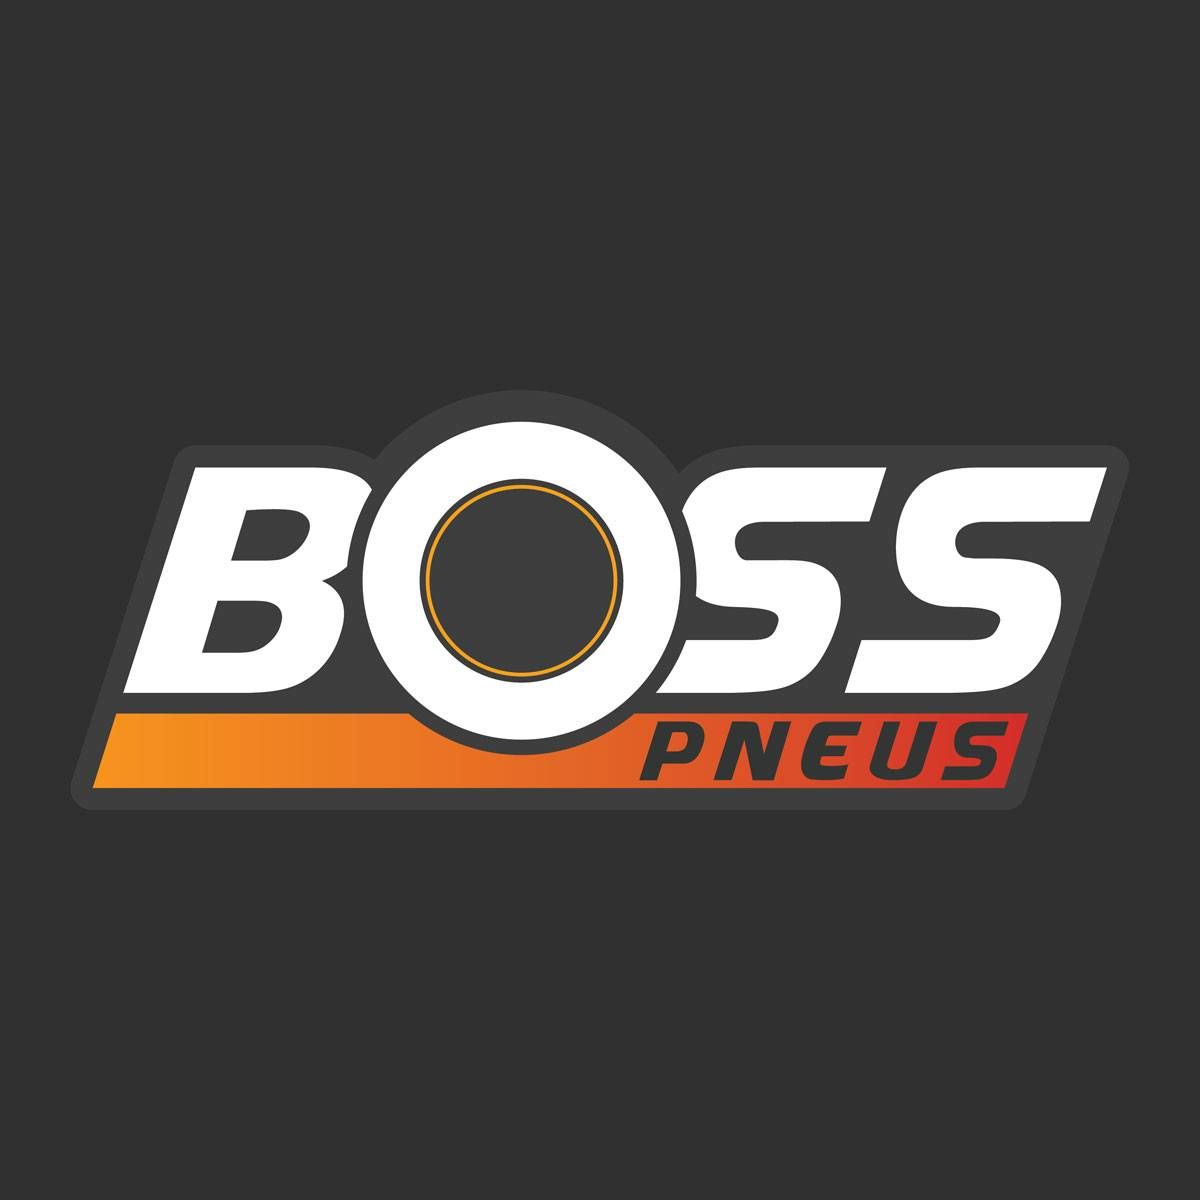 Boss Pneus